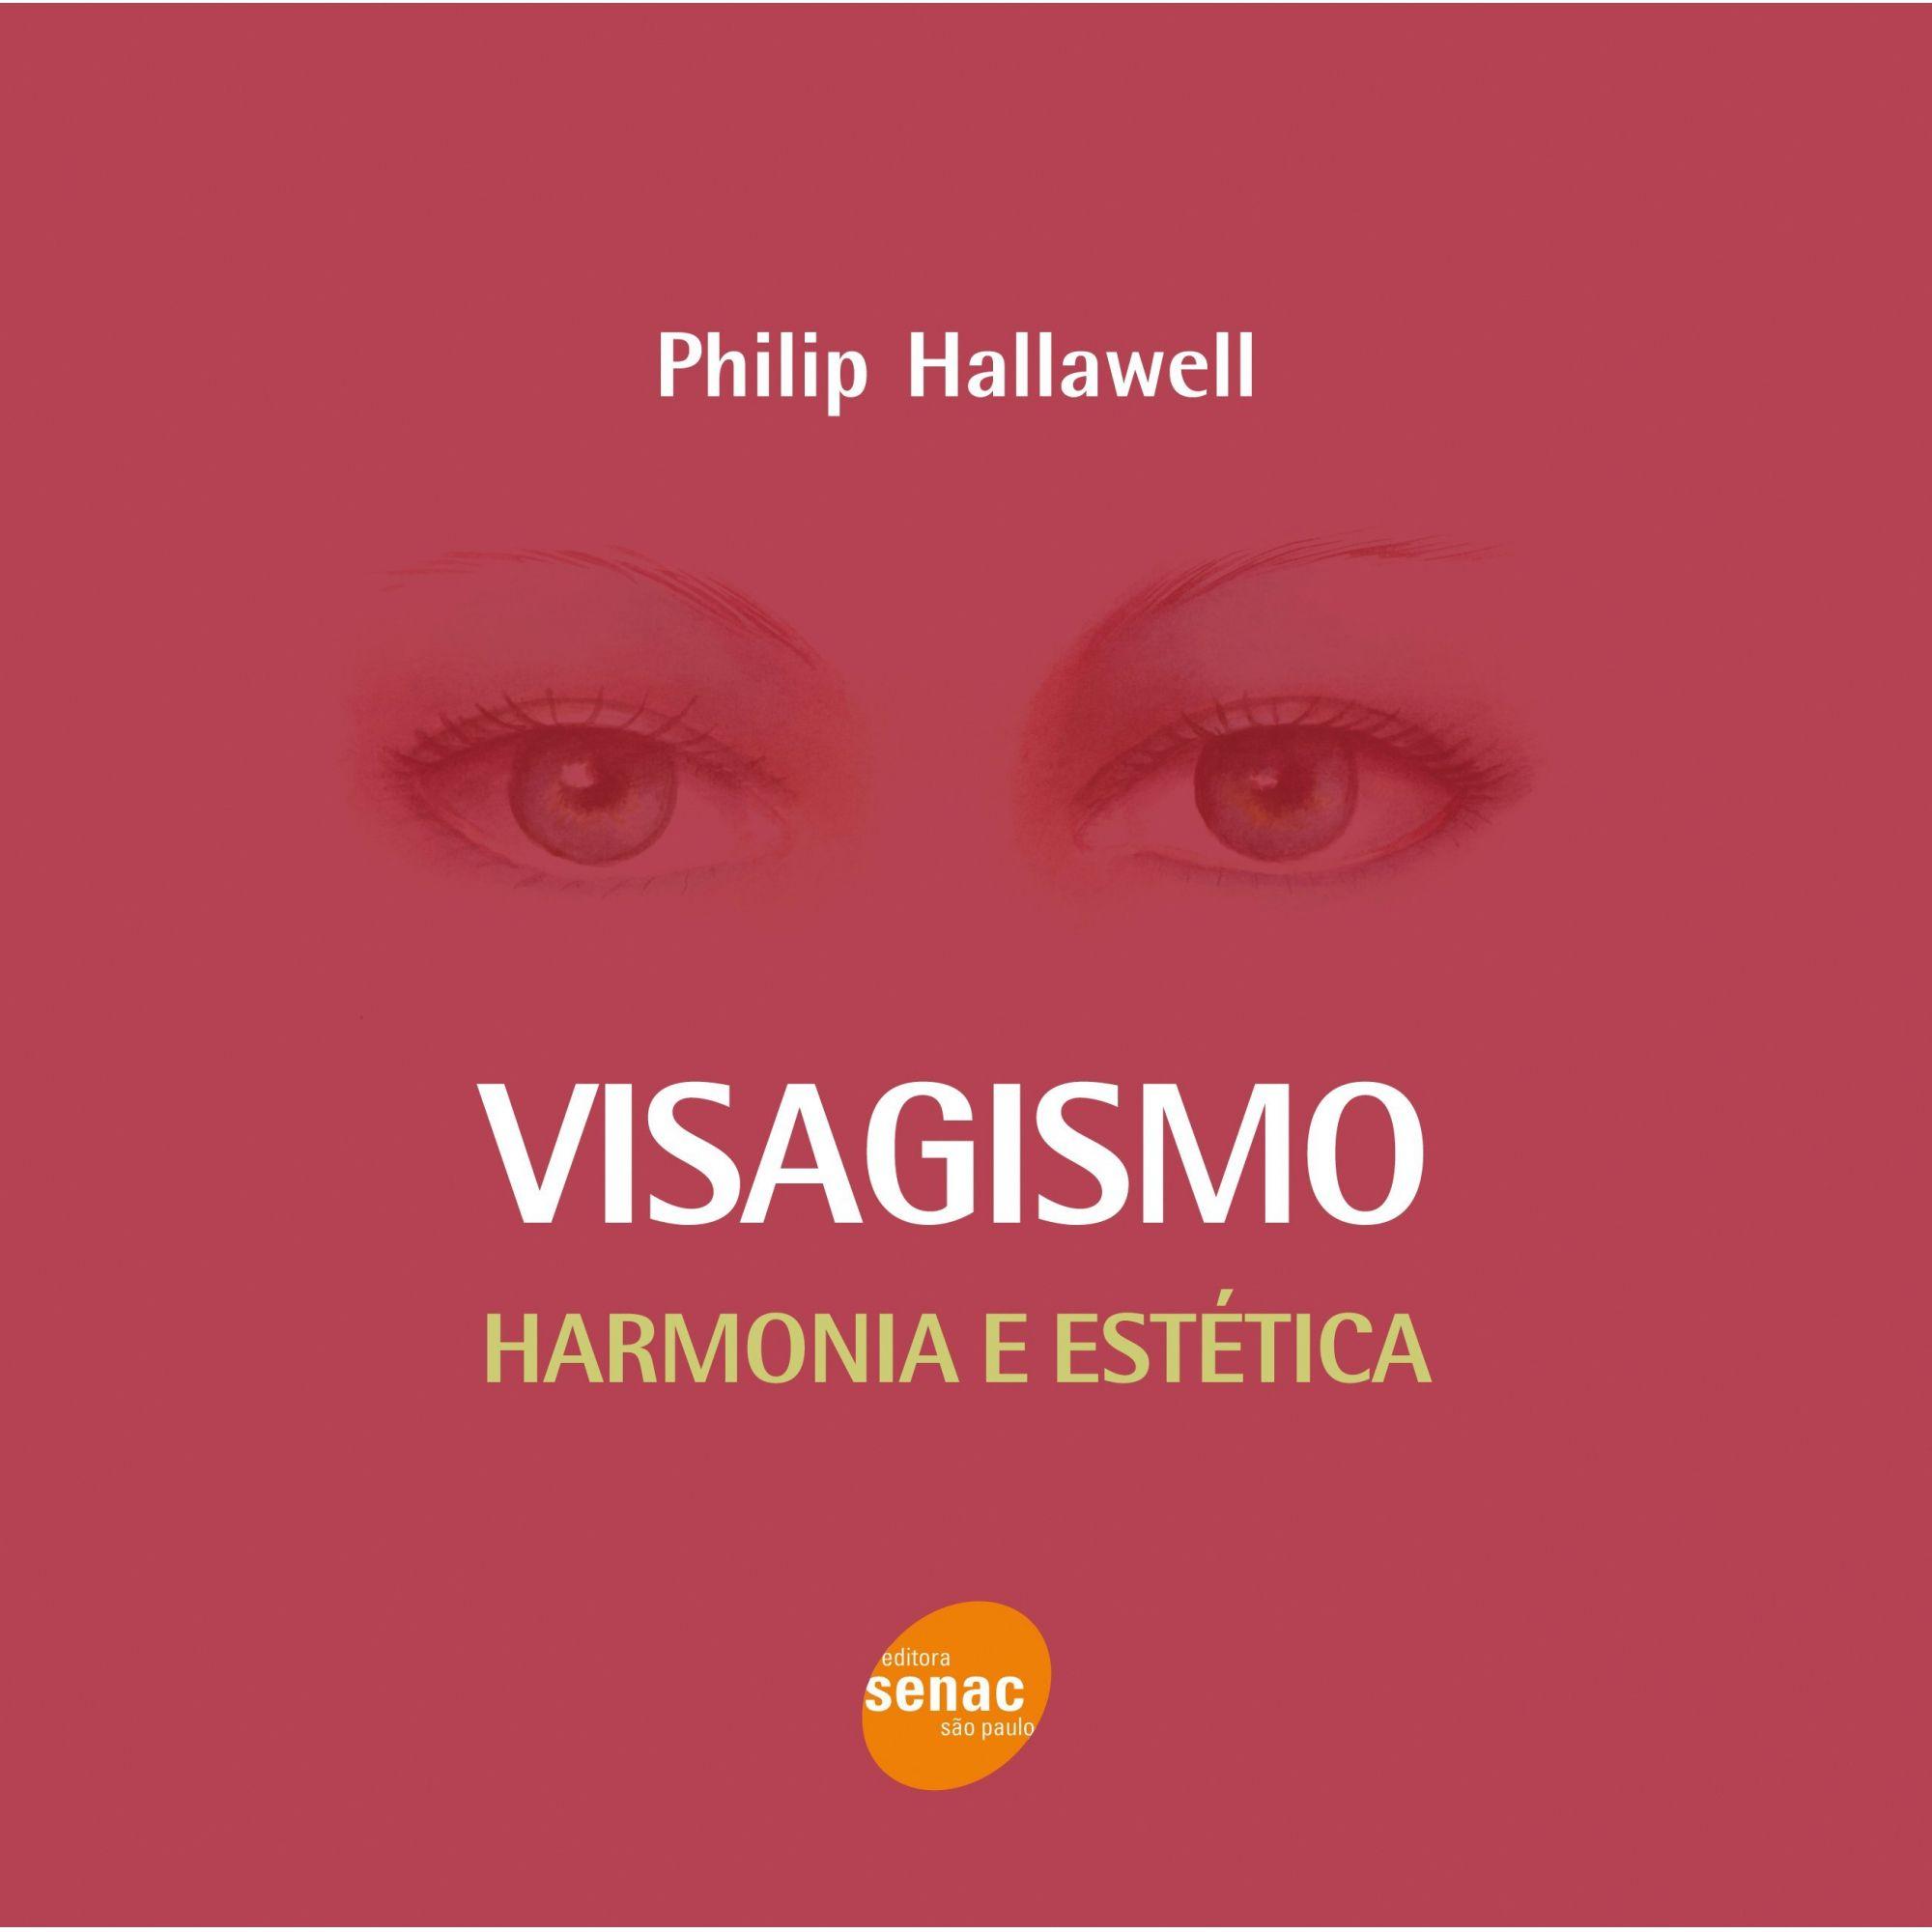 Visagismo : Harmonia e estética